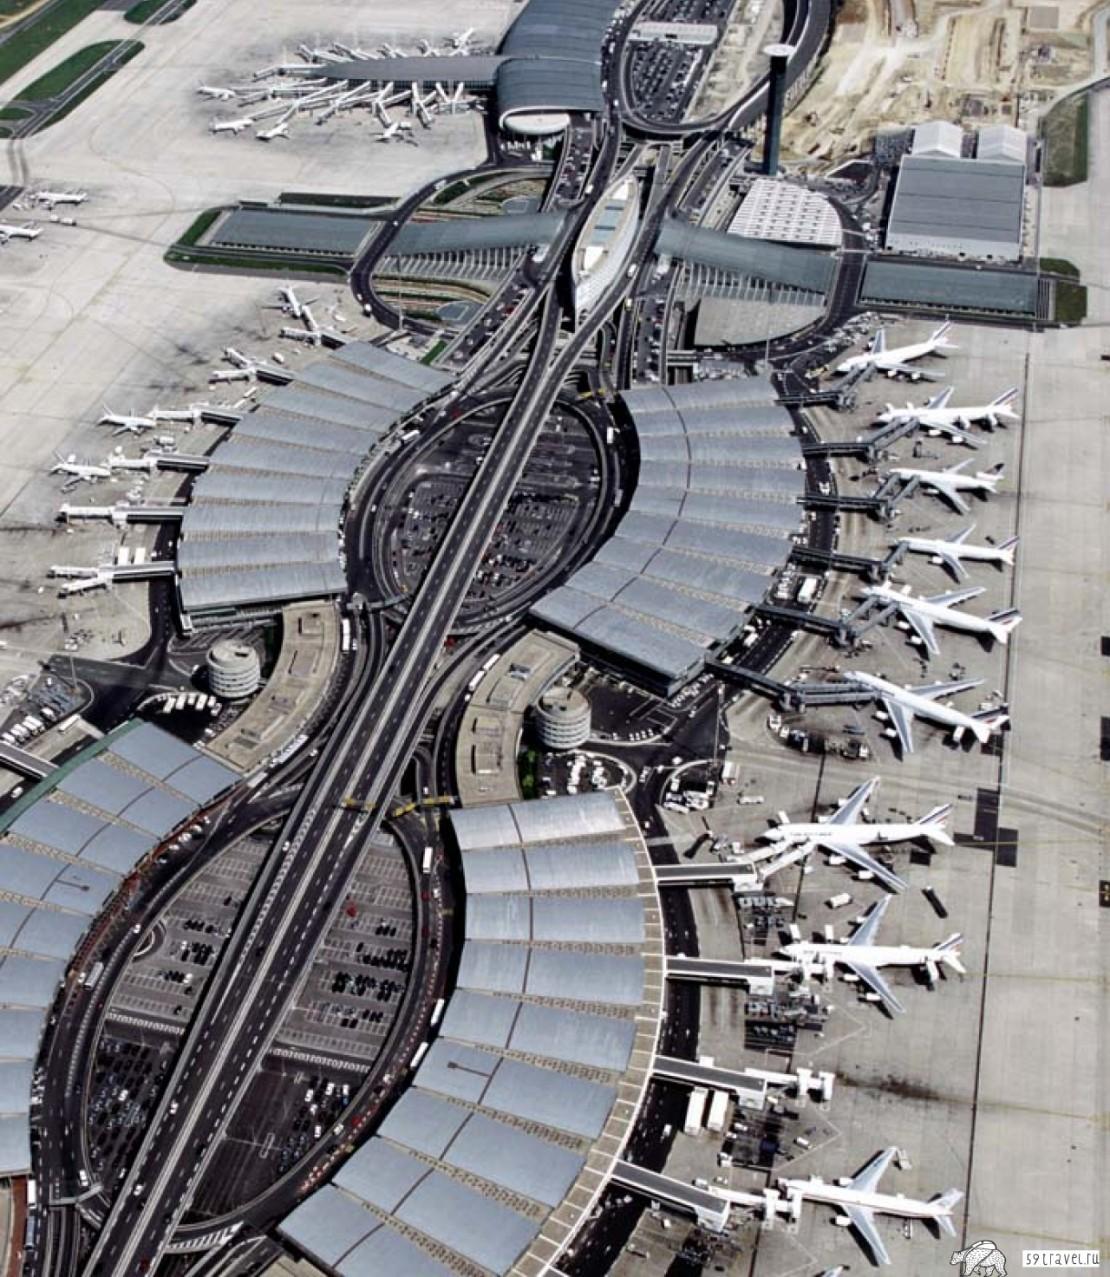 Аэропорт Париж - Руасси-Шарль-де-Голль (Airport Roissy-Charles de Gaulle), Франция